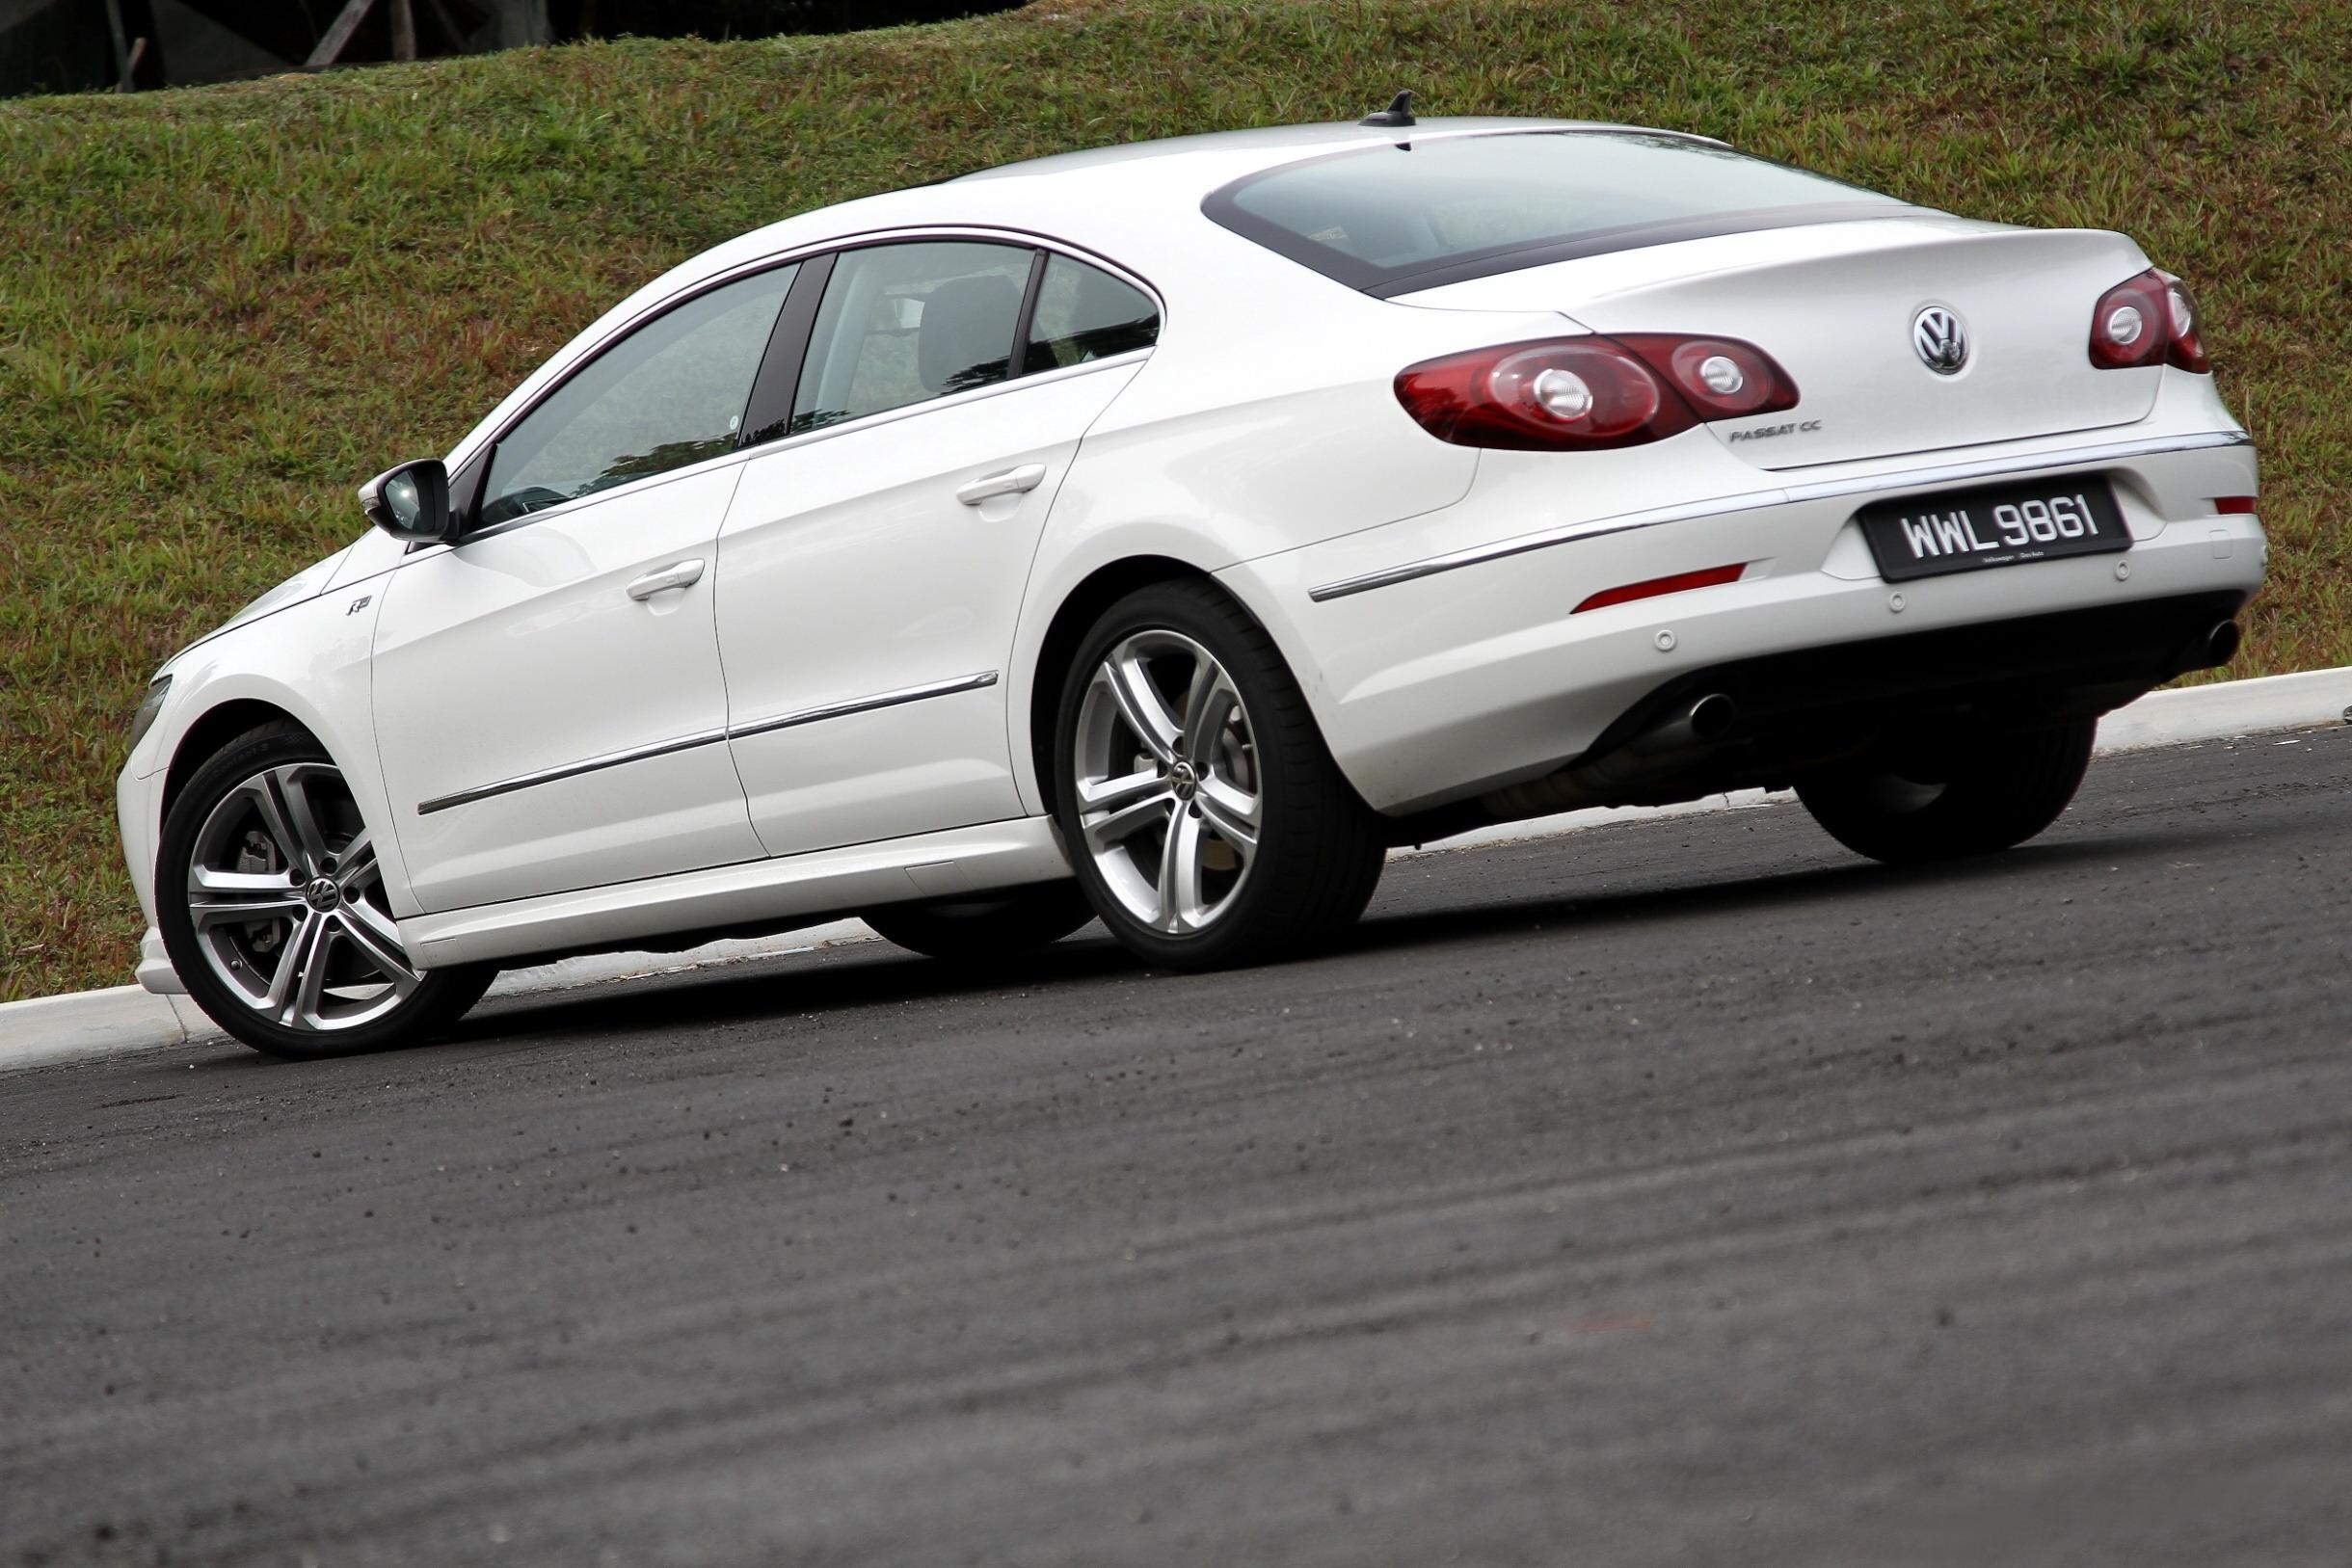 news gt gte speed and passat cars top volkswagen cc reviews